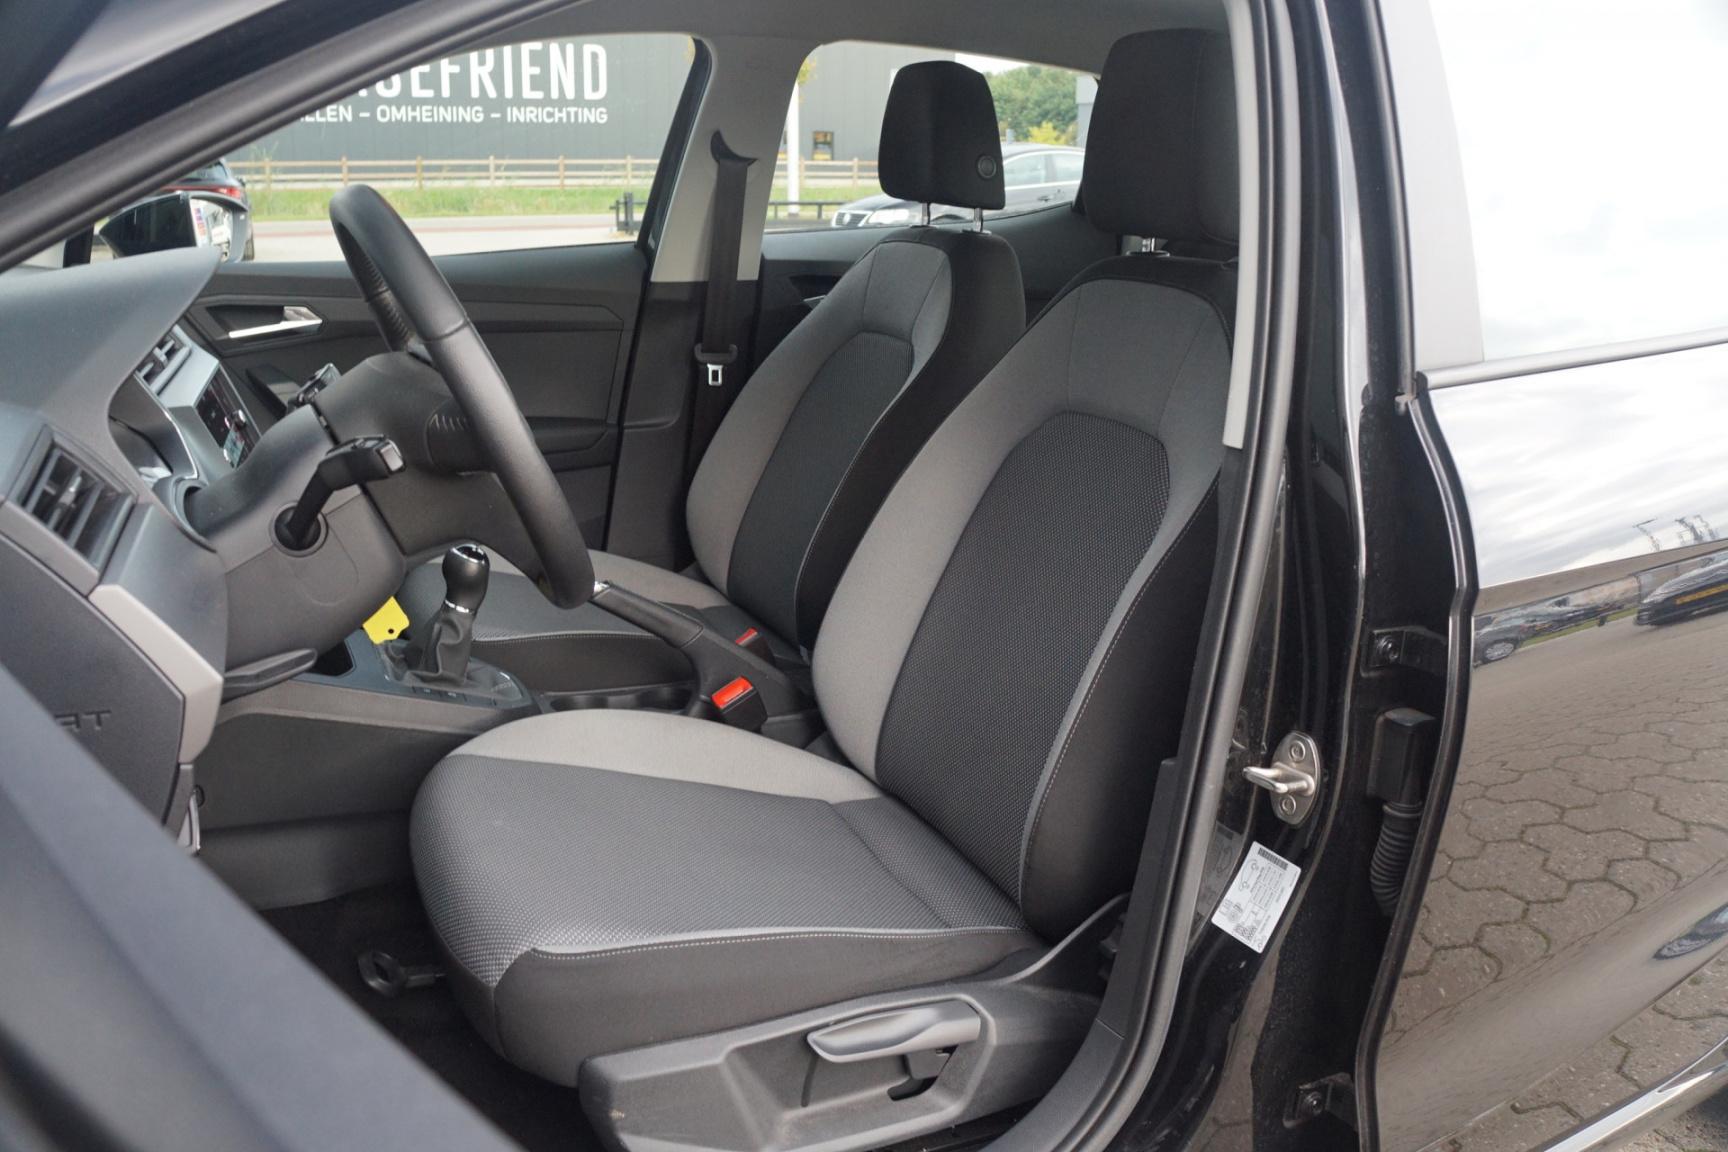 SEAT-Ibiza-16